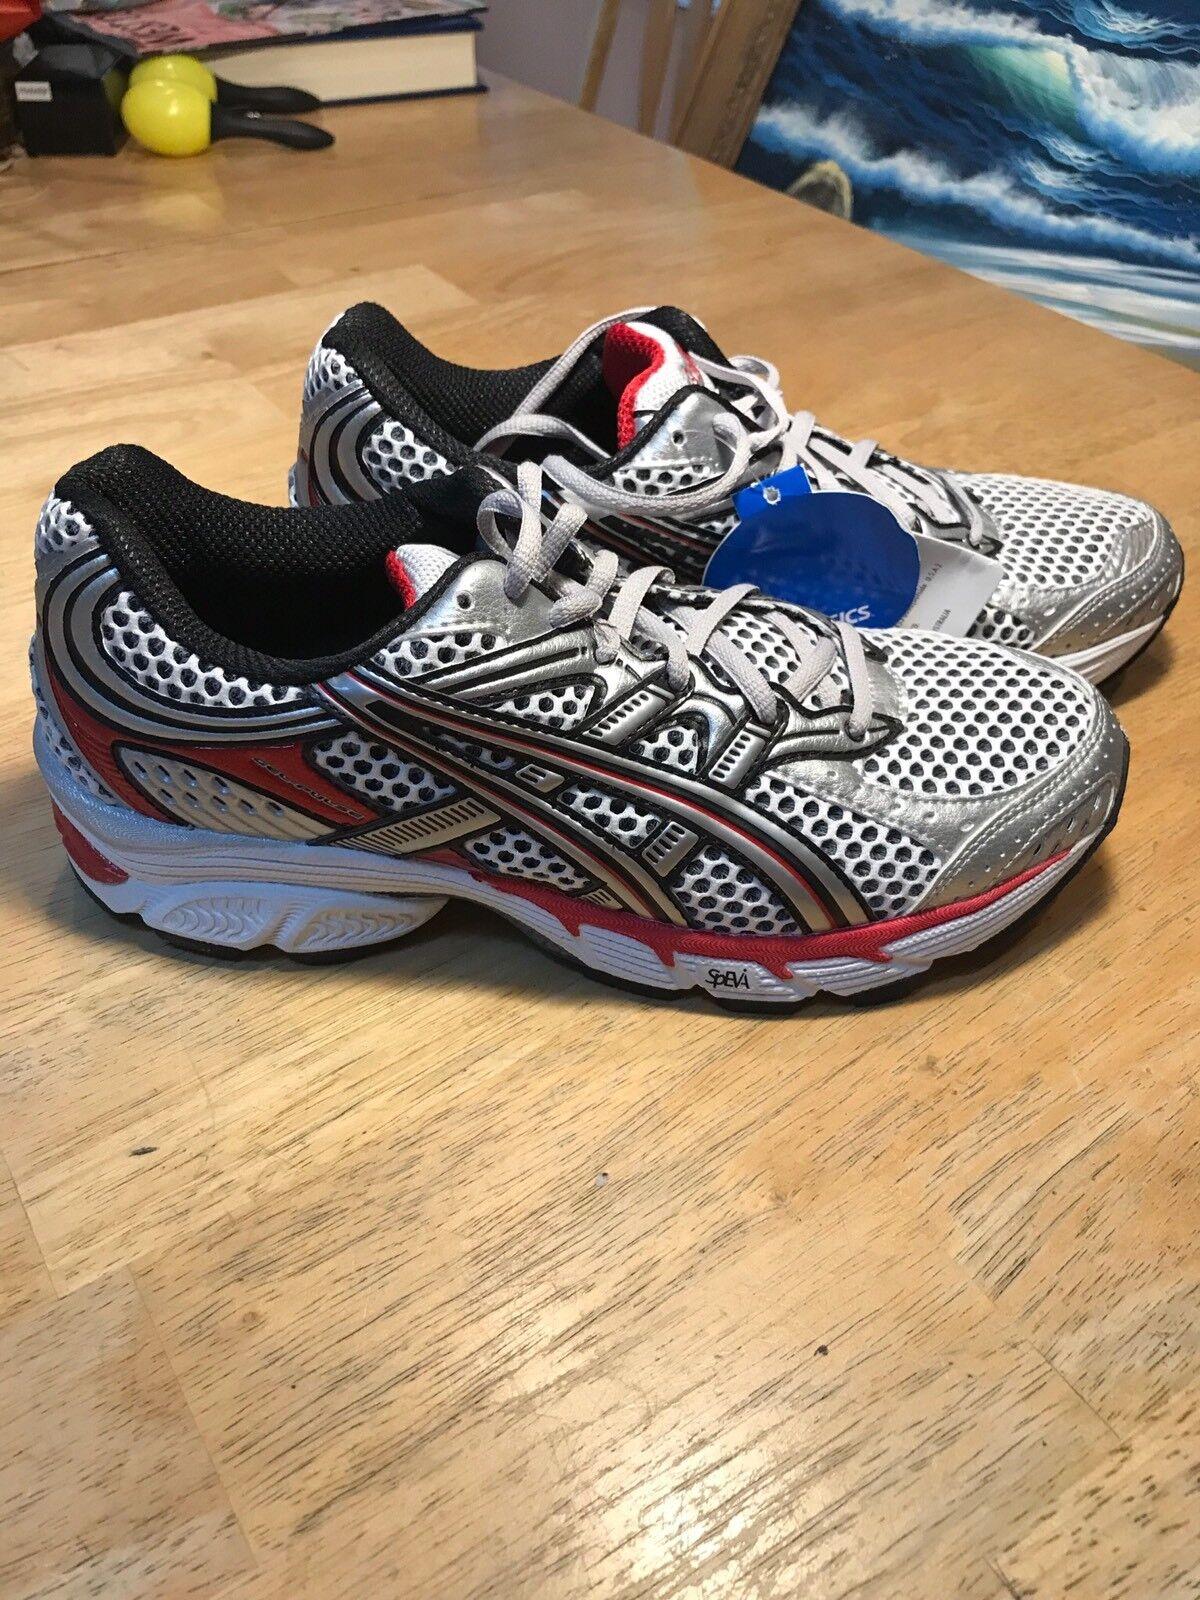 New Asics Gel Pulse Running Chaussures,